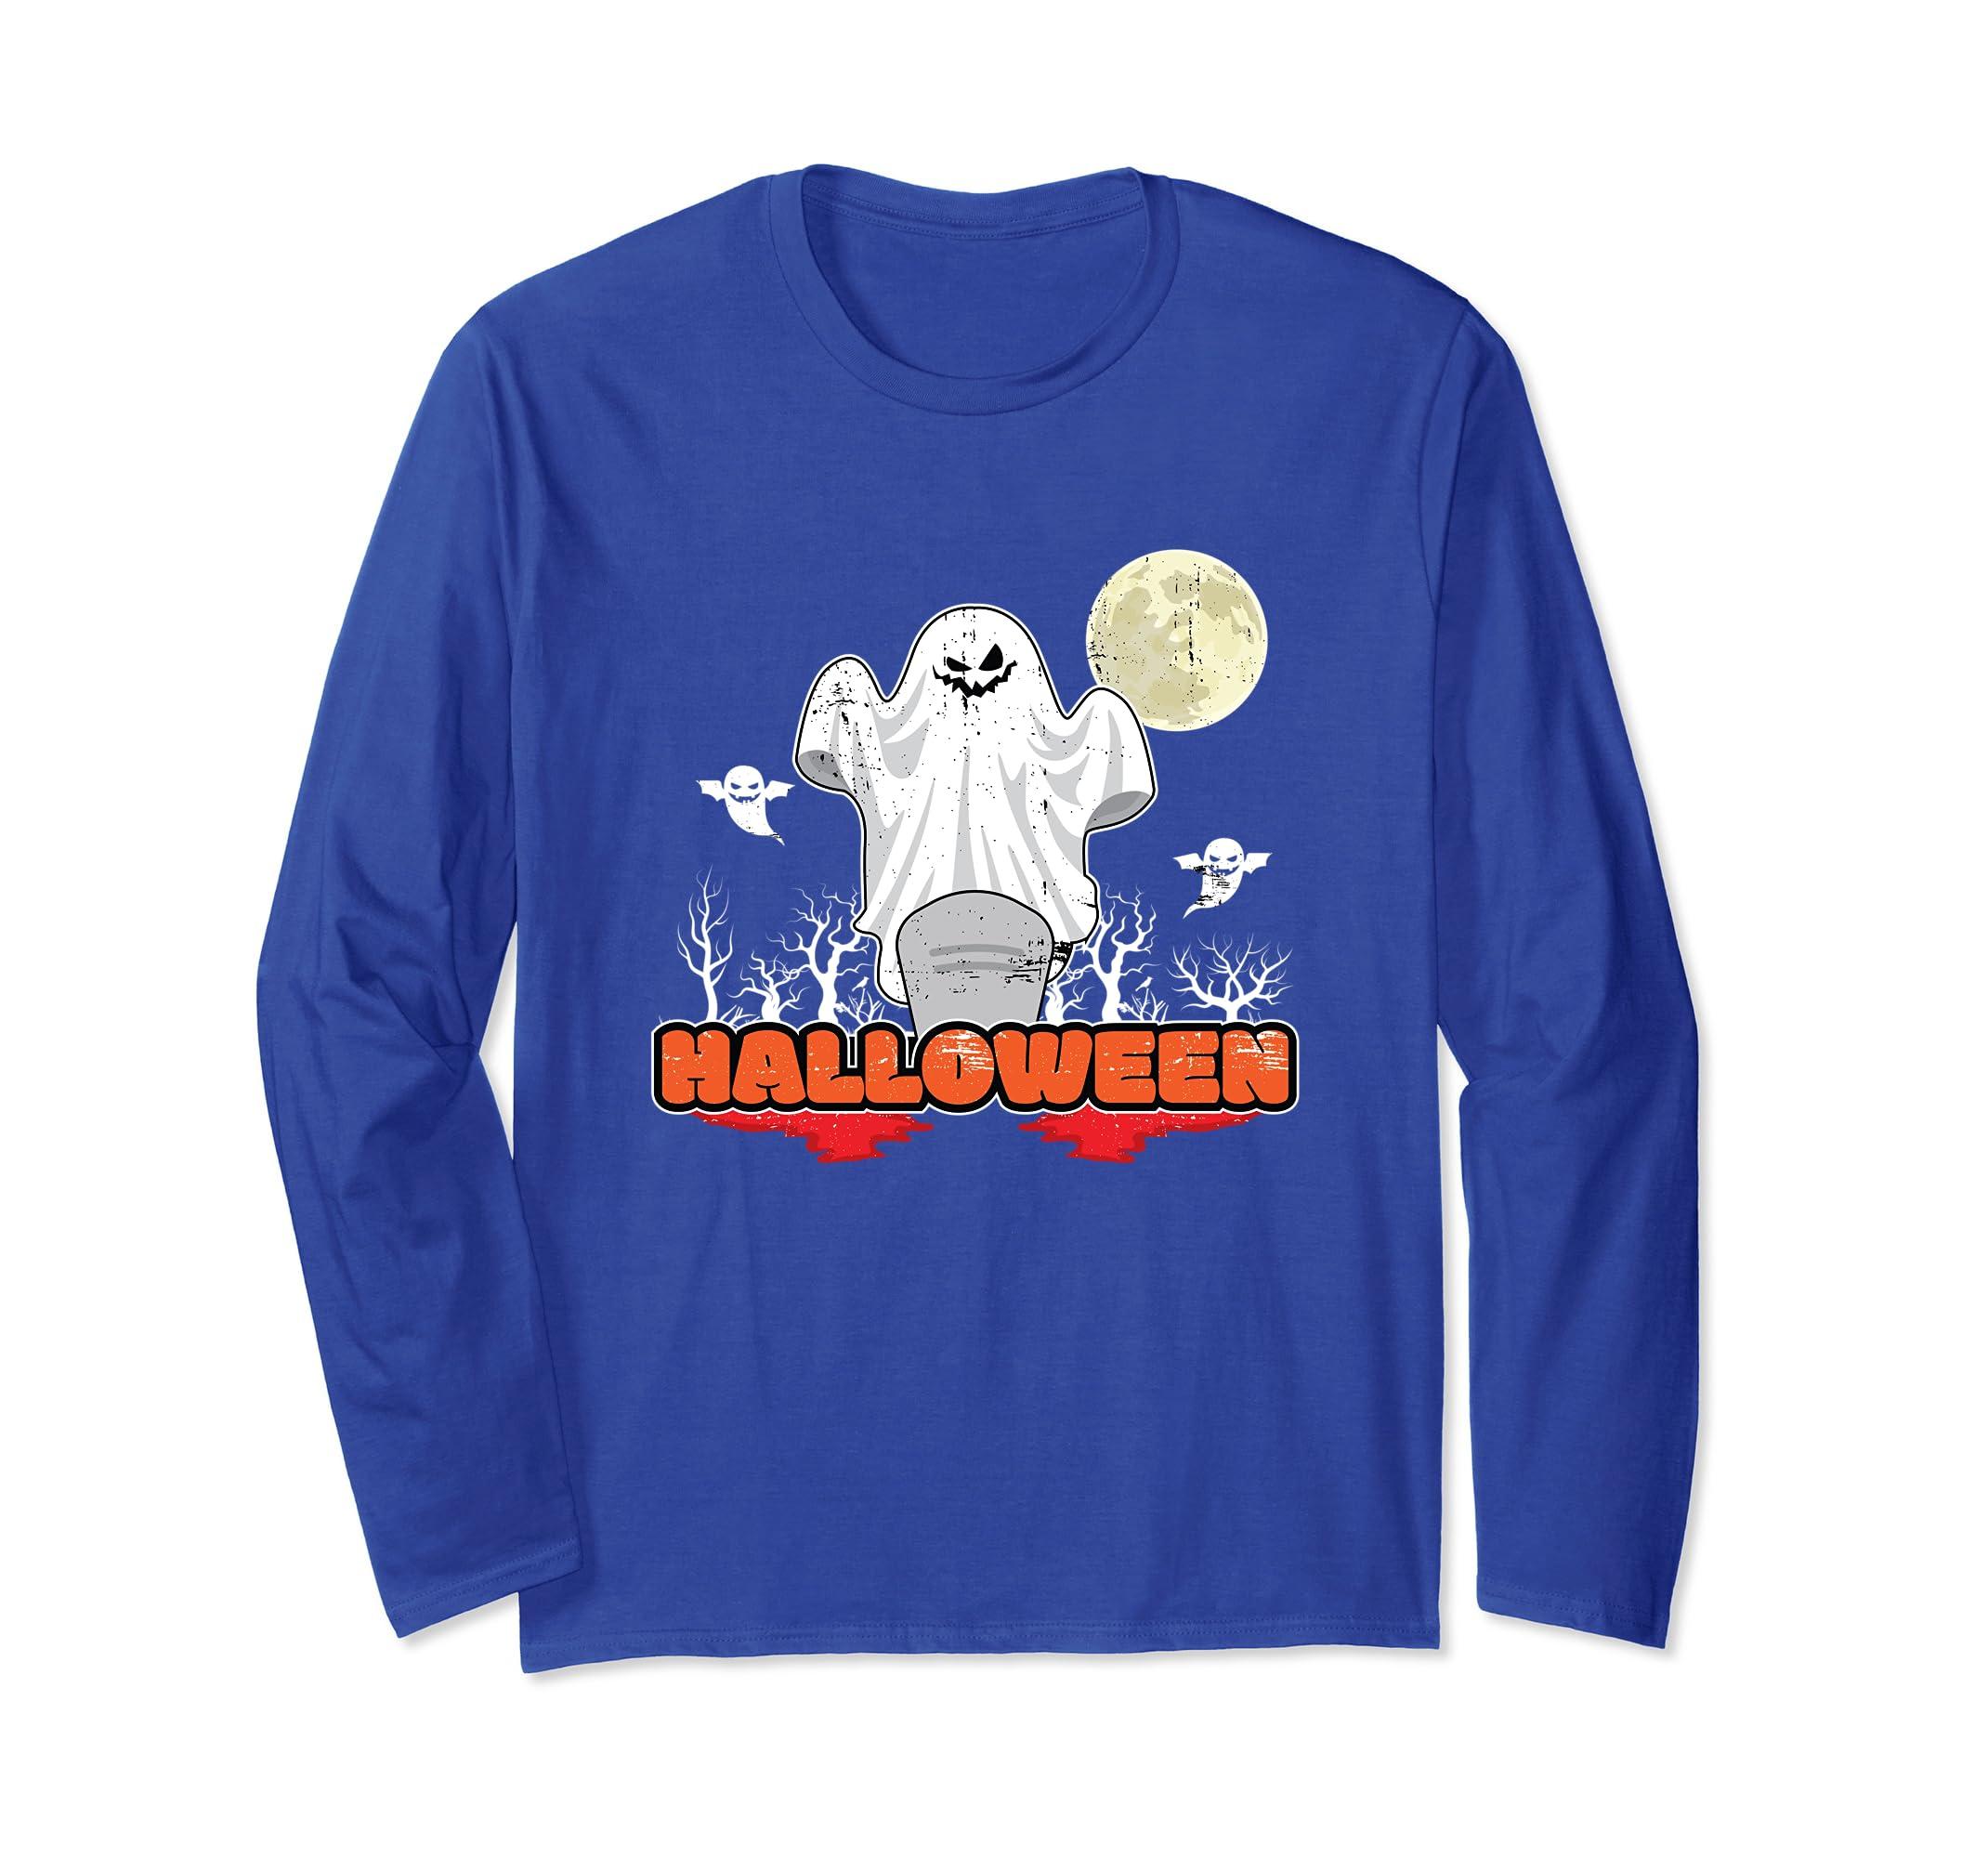 Halloween Long Sleeve T-Shirt Ghost Season Greetings-ANZ